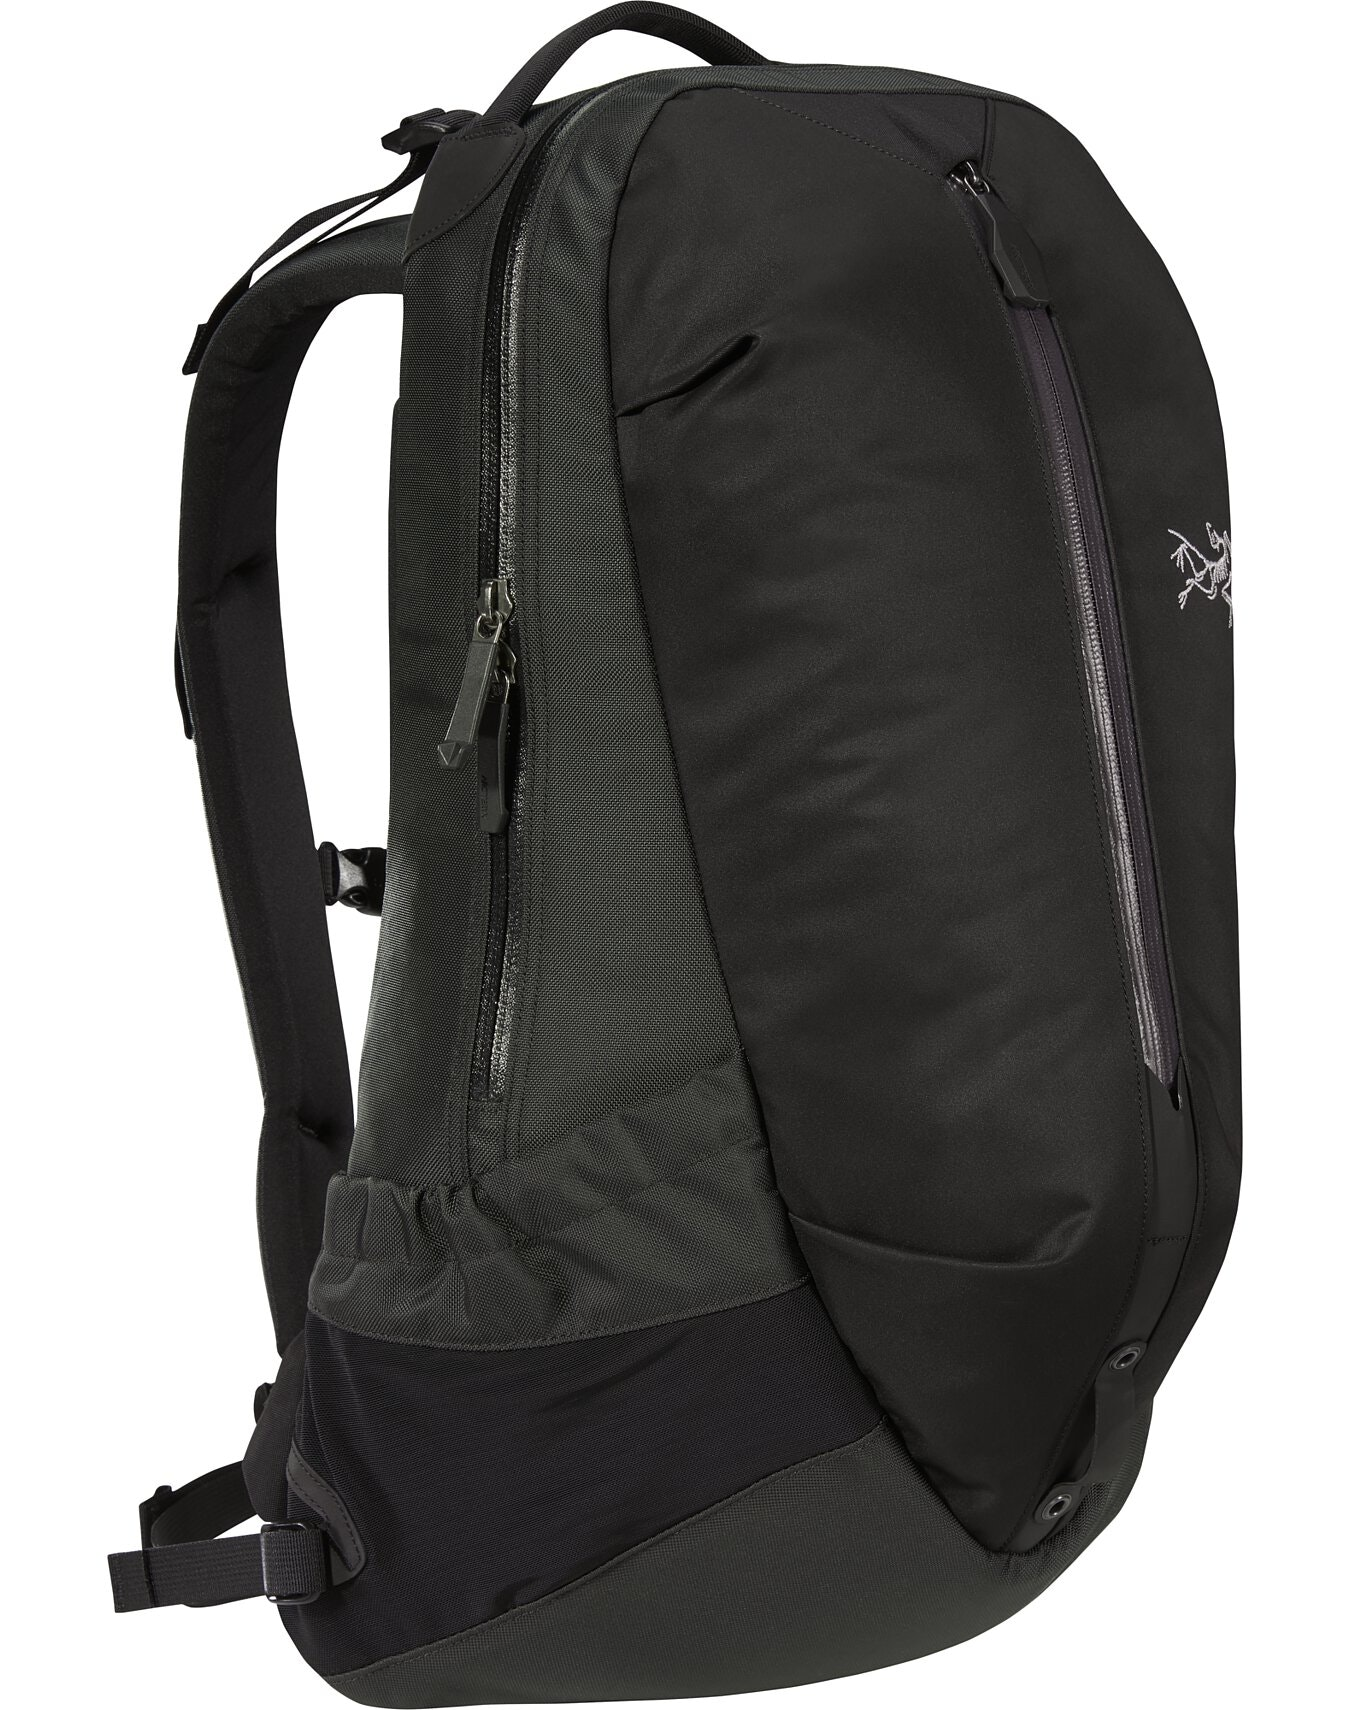 Arro 22 Backpack Carbon Copy